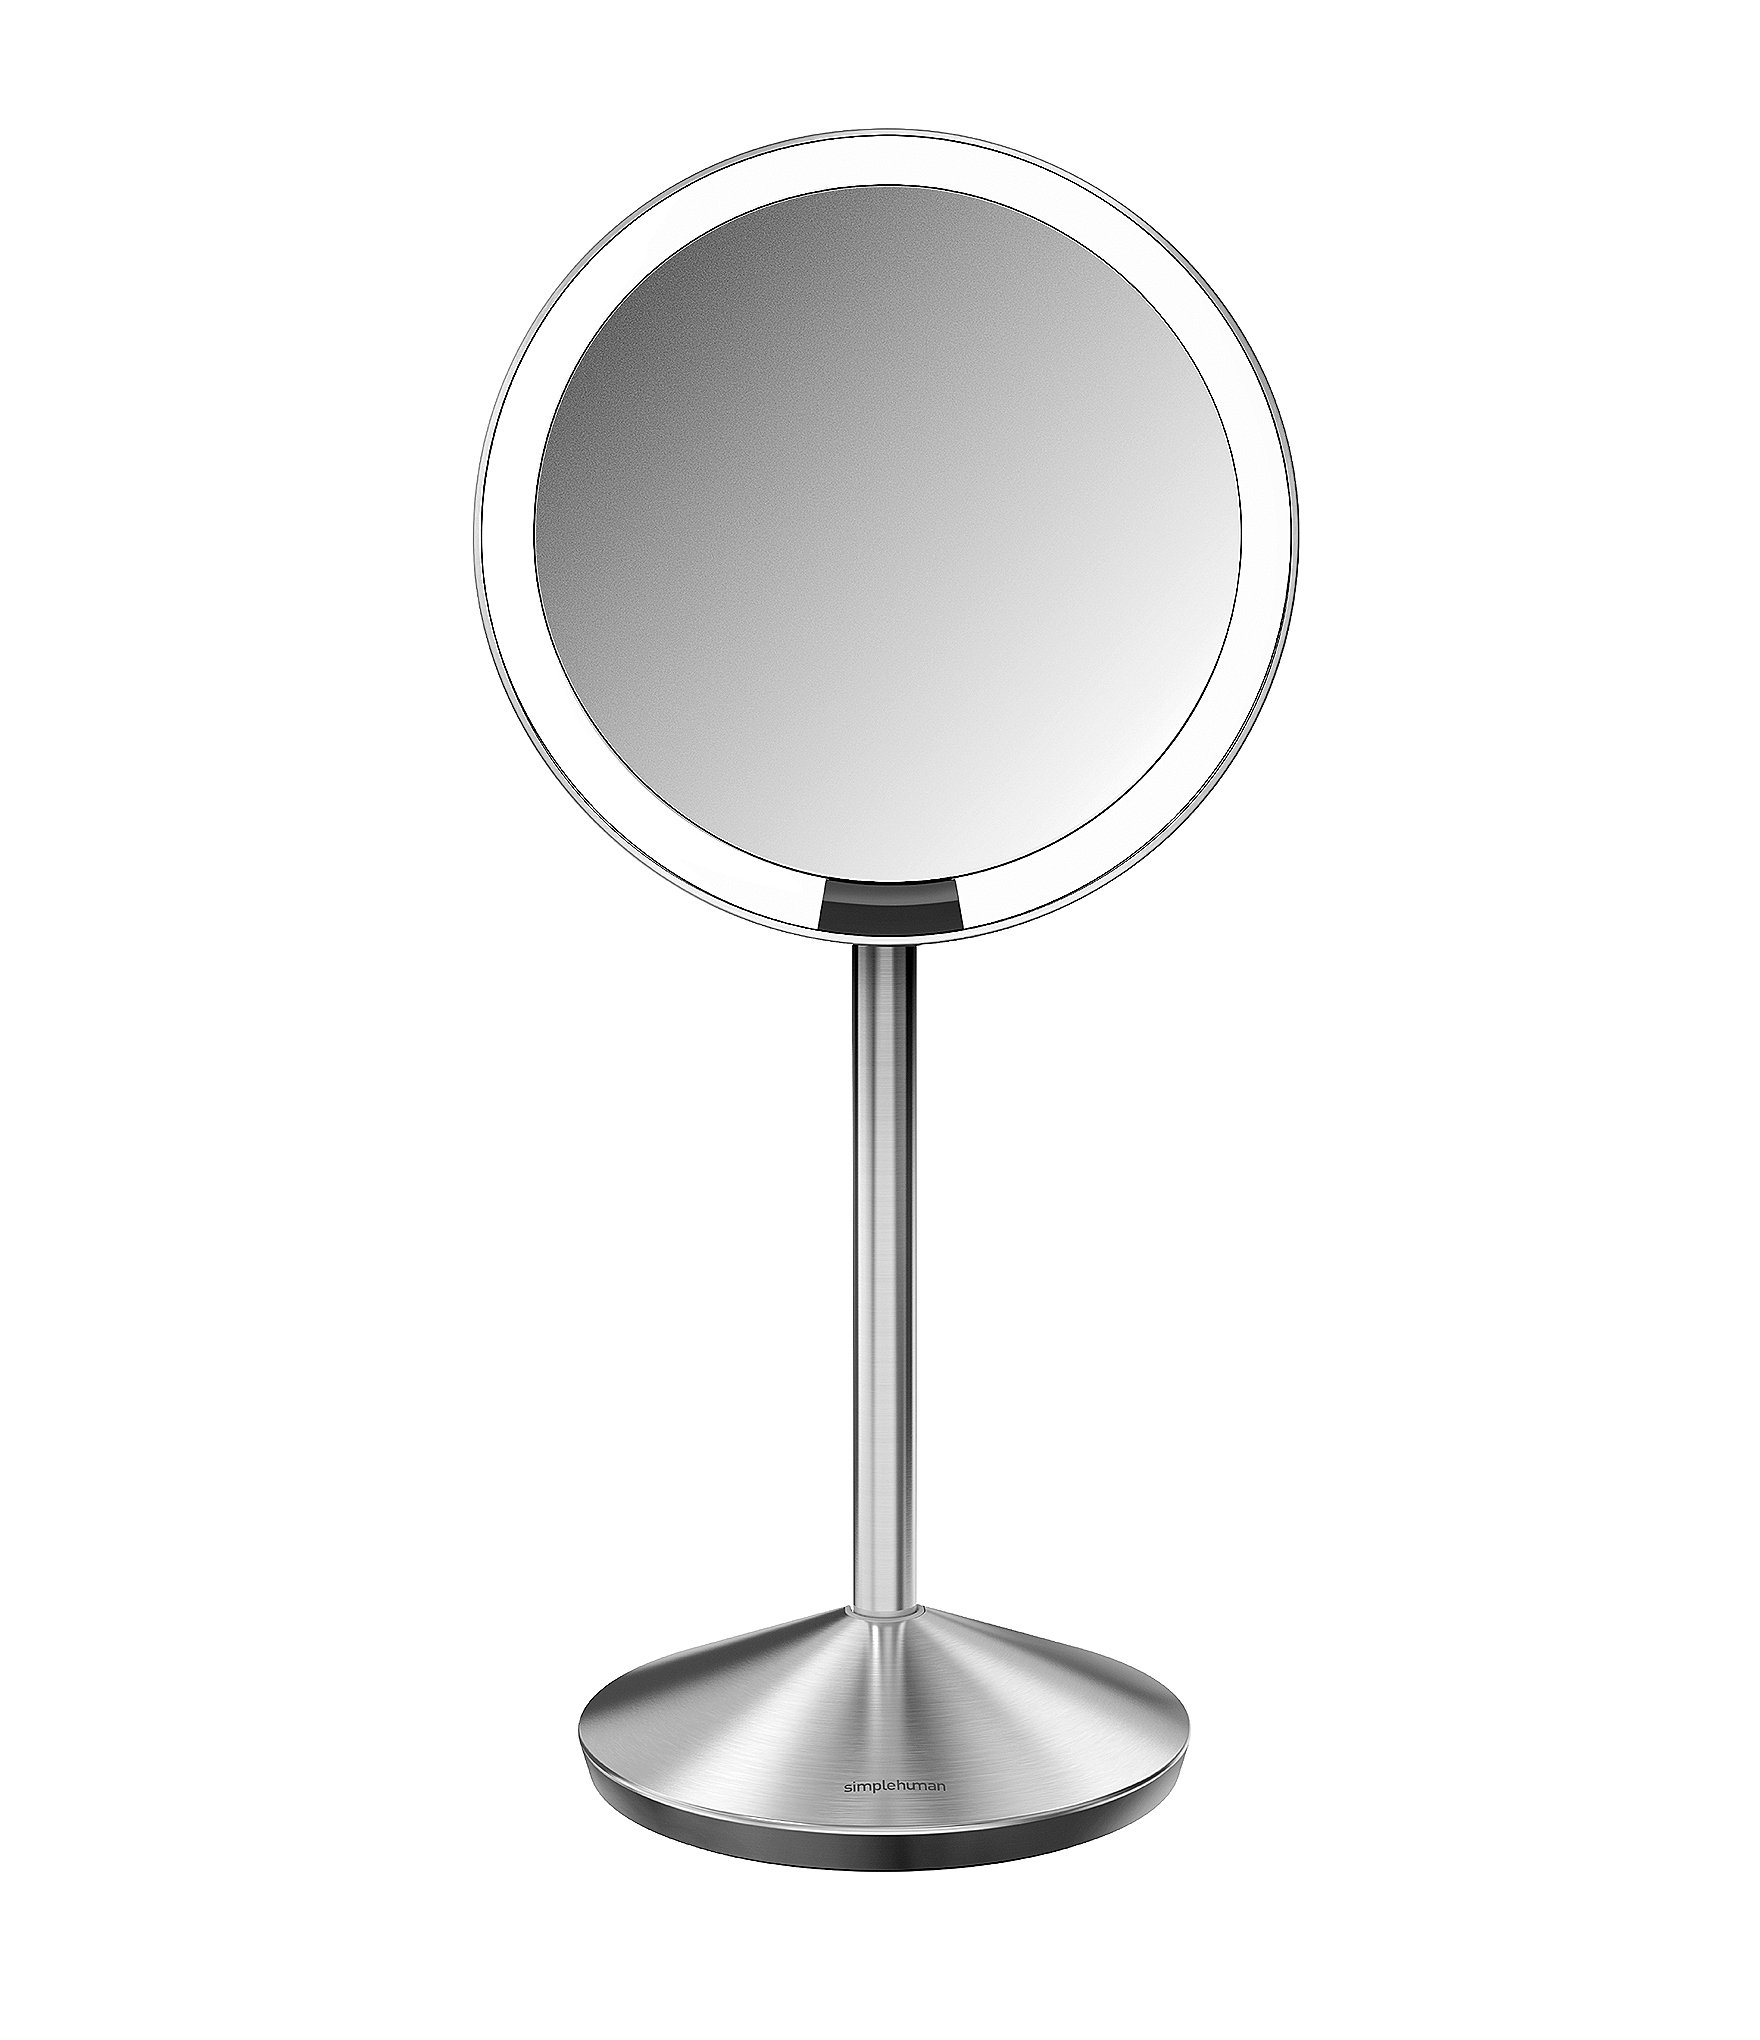 Simplehuman 5in Mini 10x Magnification Sensor Mirror